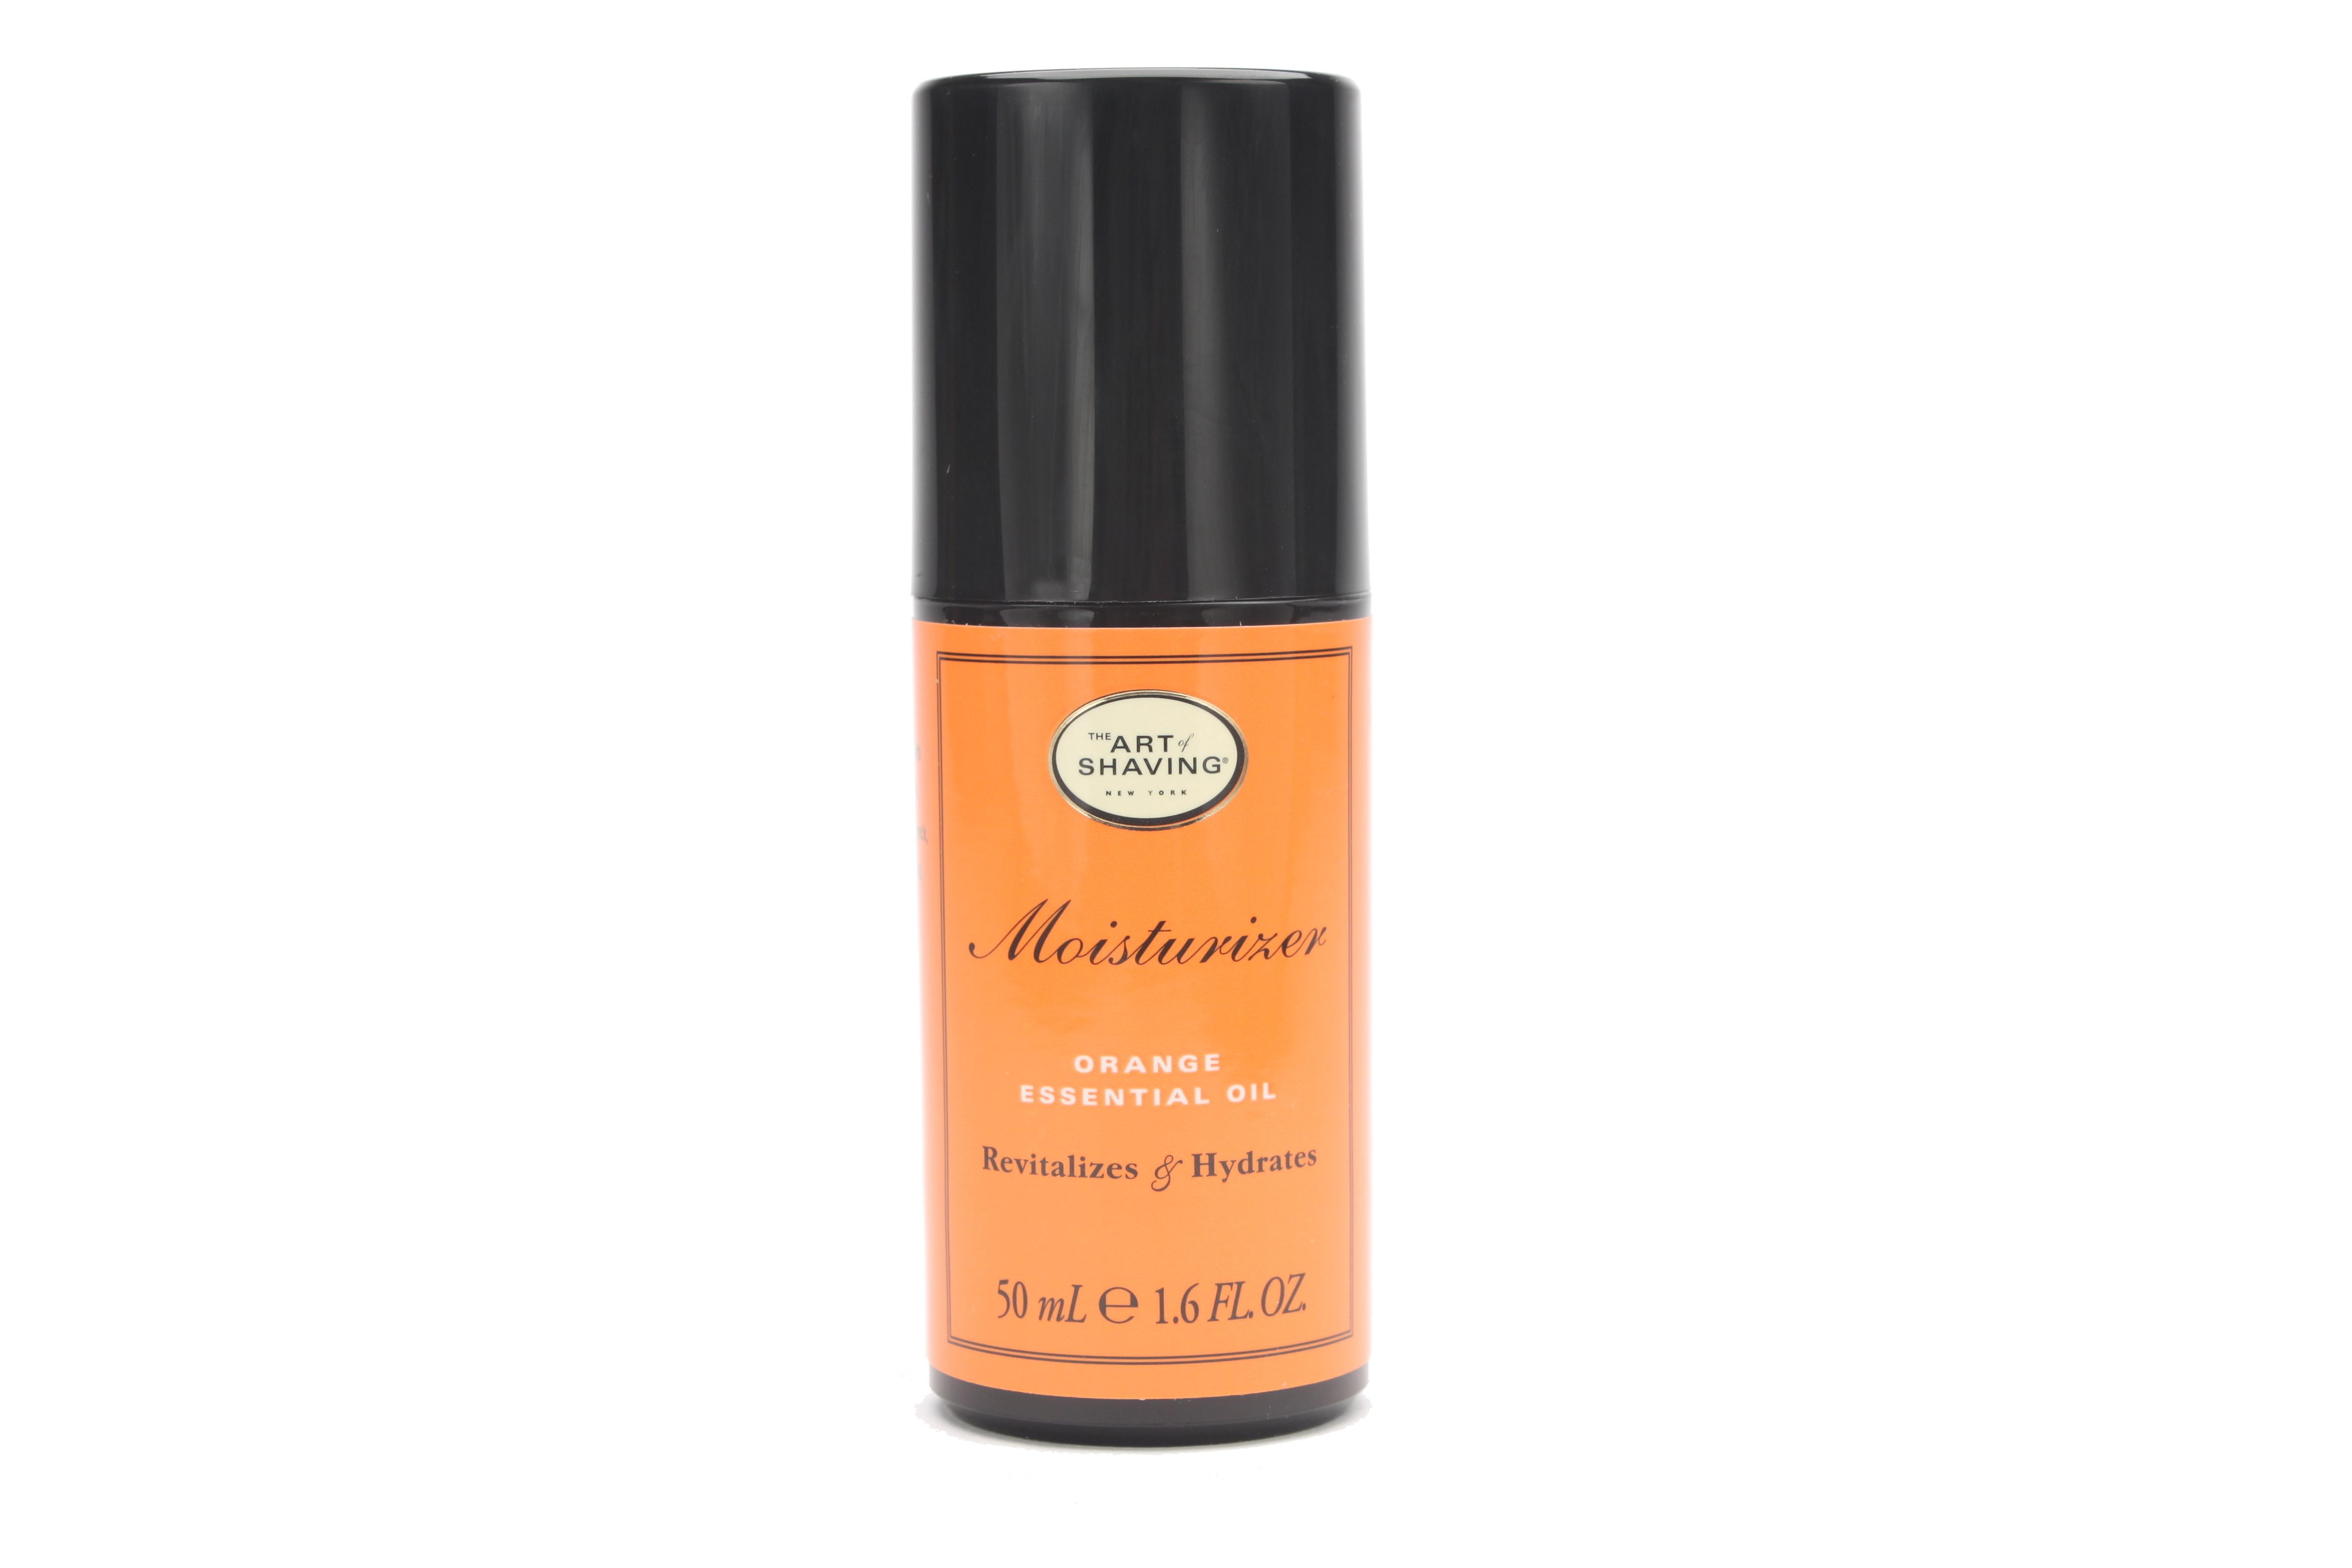 Orange Essential Oil Moisturizer 1.6 oz